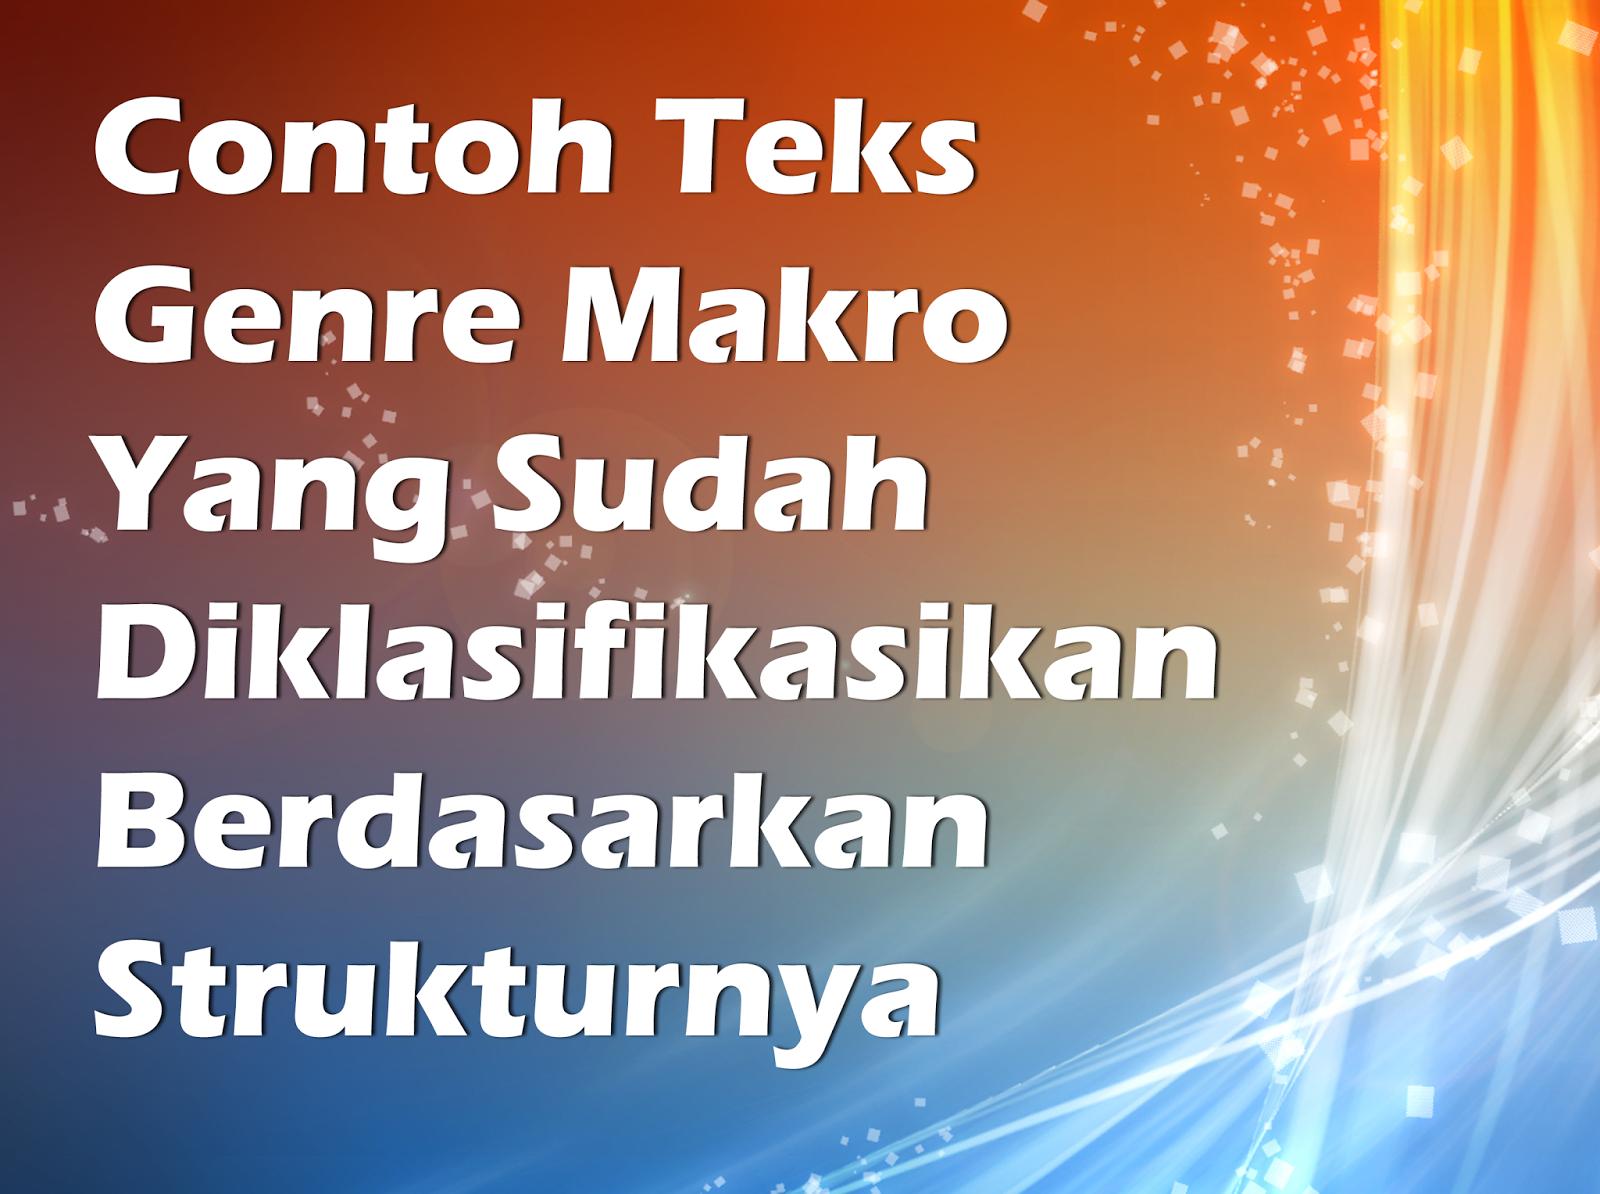 Contoh Teks Genre Makro Contoh 0917 – Cuitan Dokter